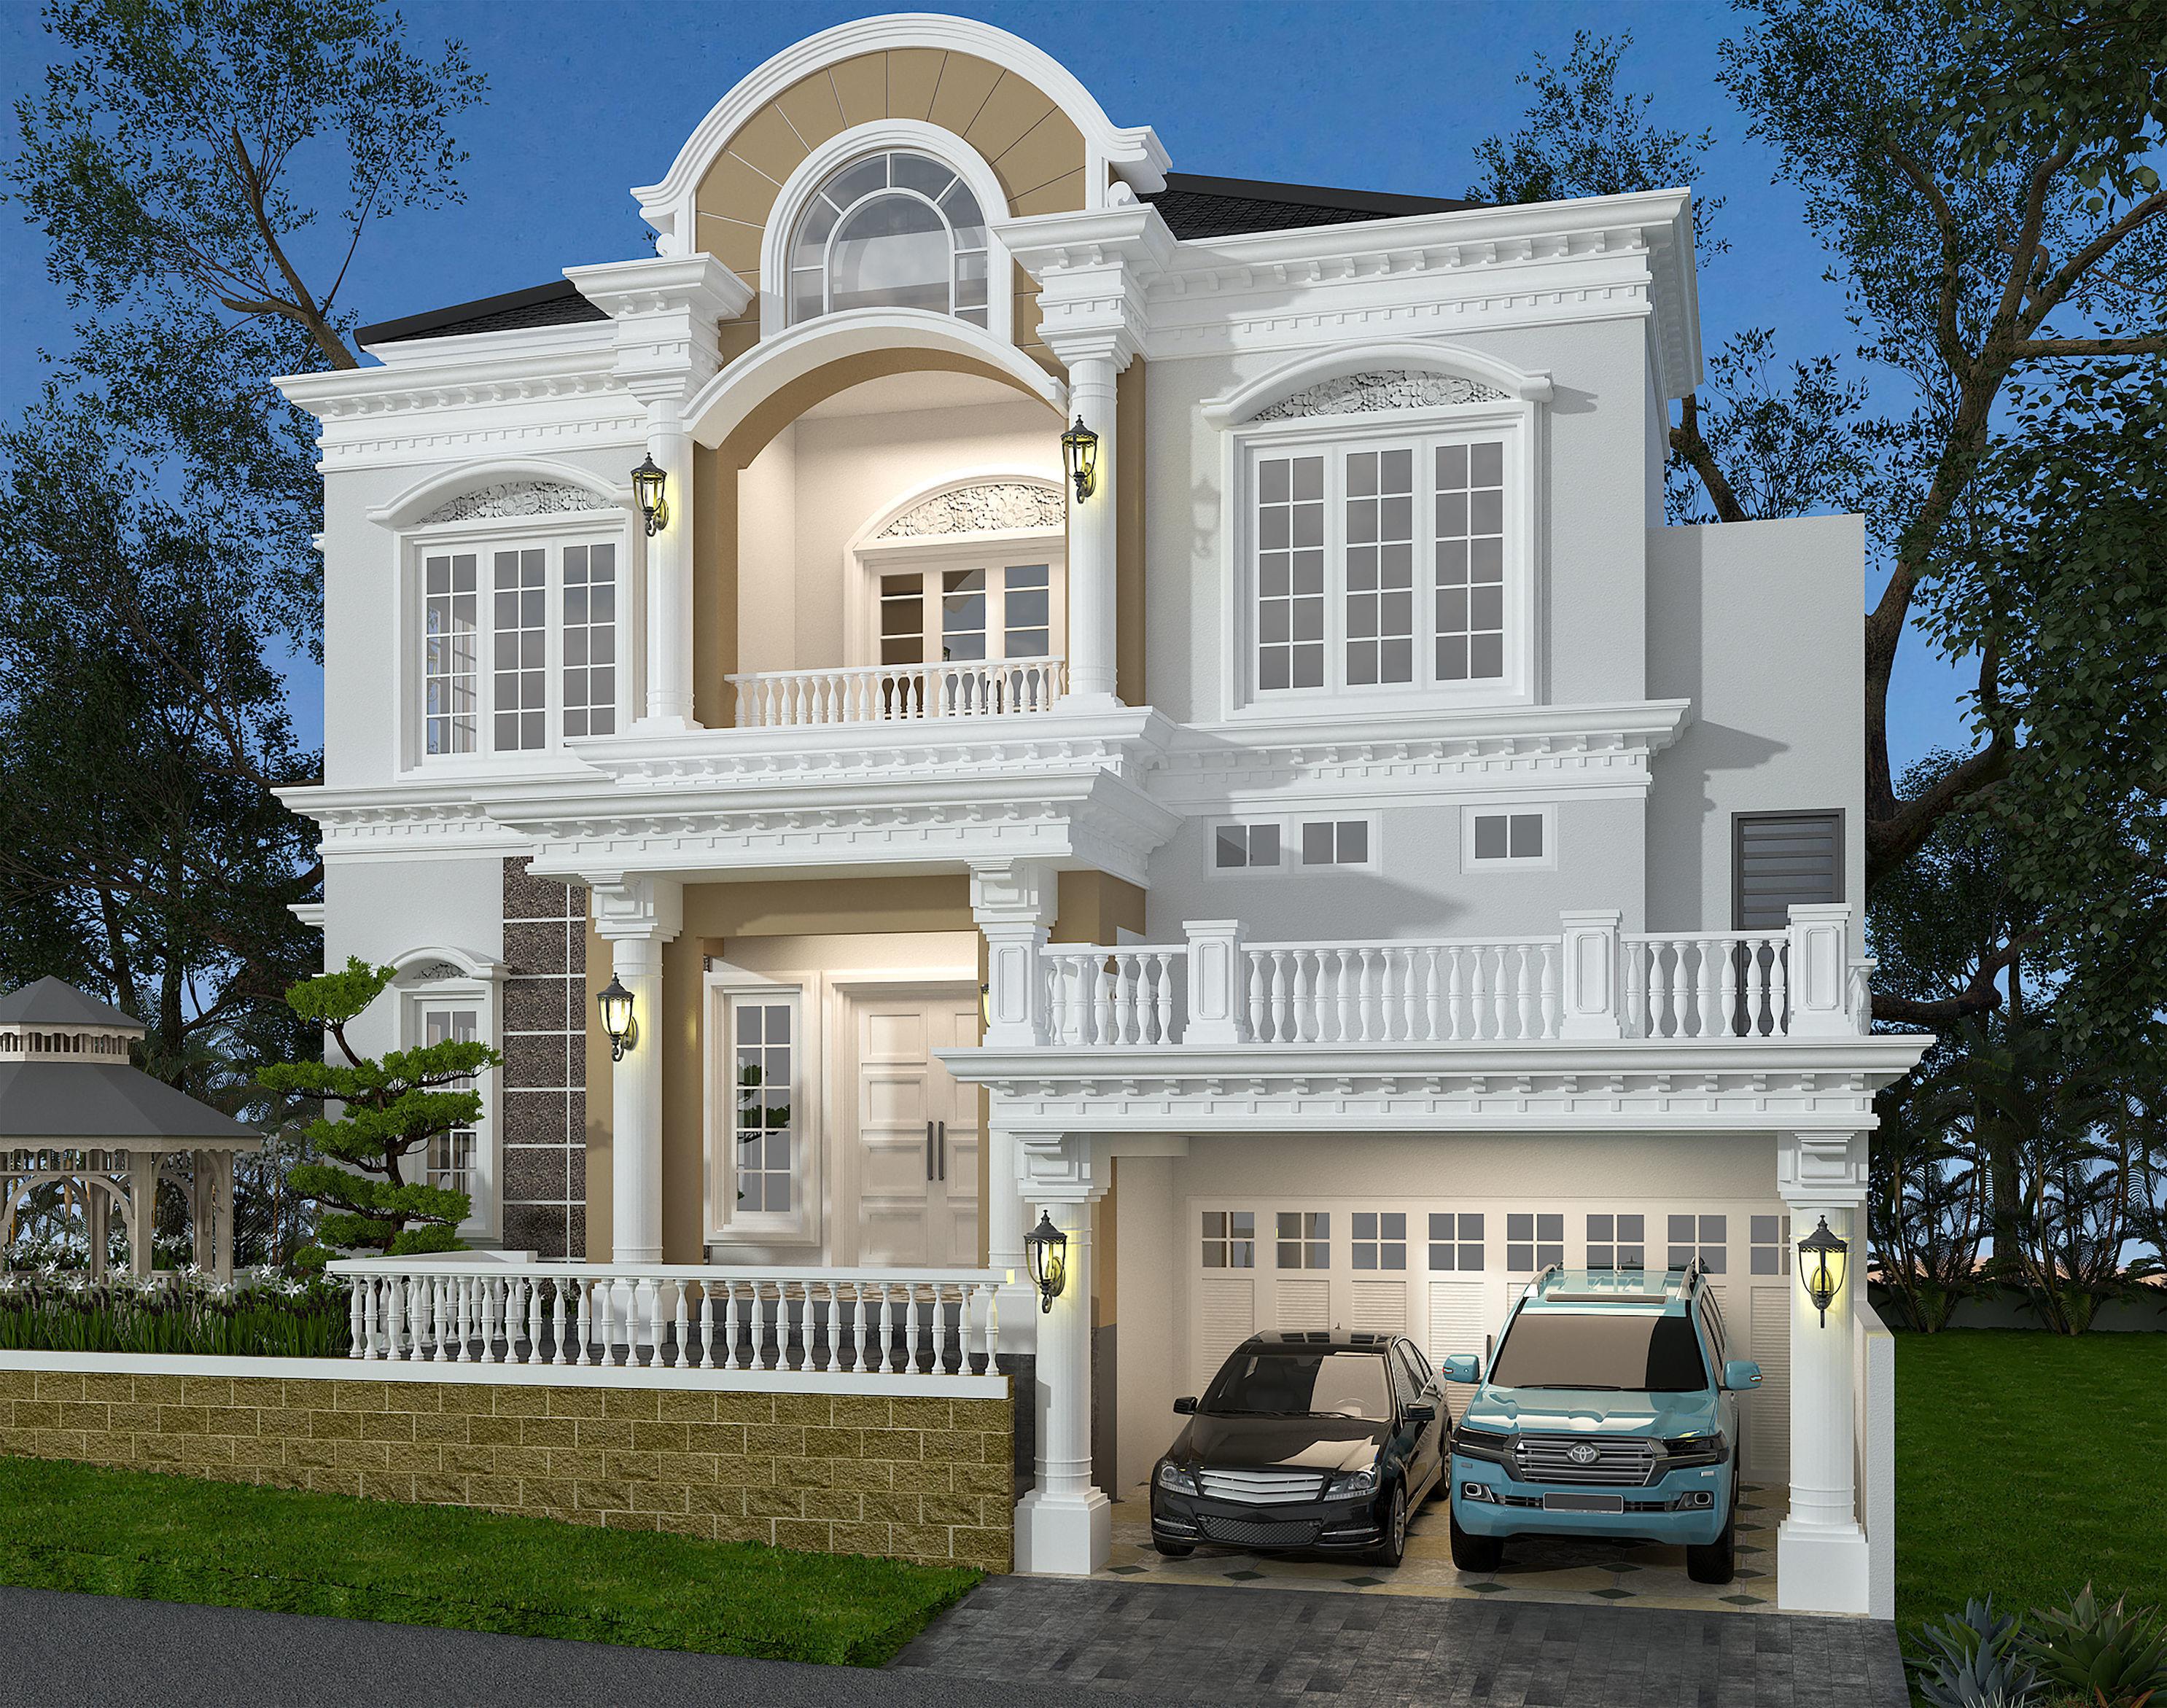 CLASSIC STYLE HOUSE FLORIDA